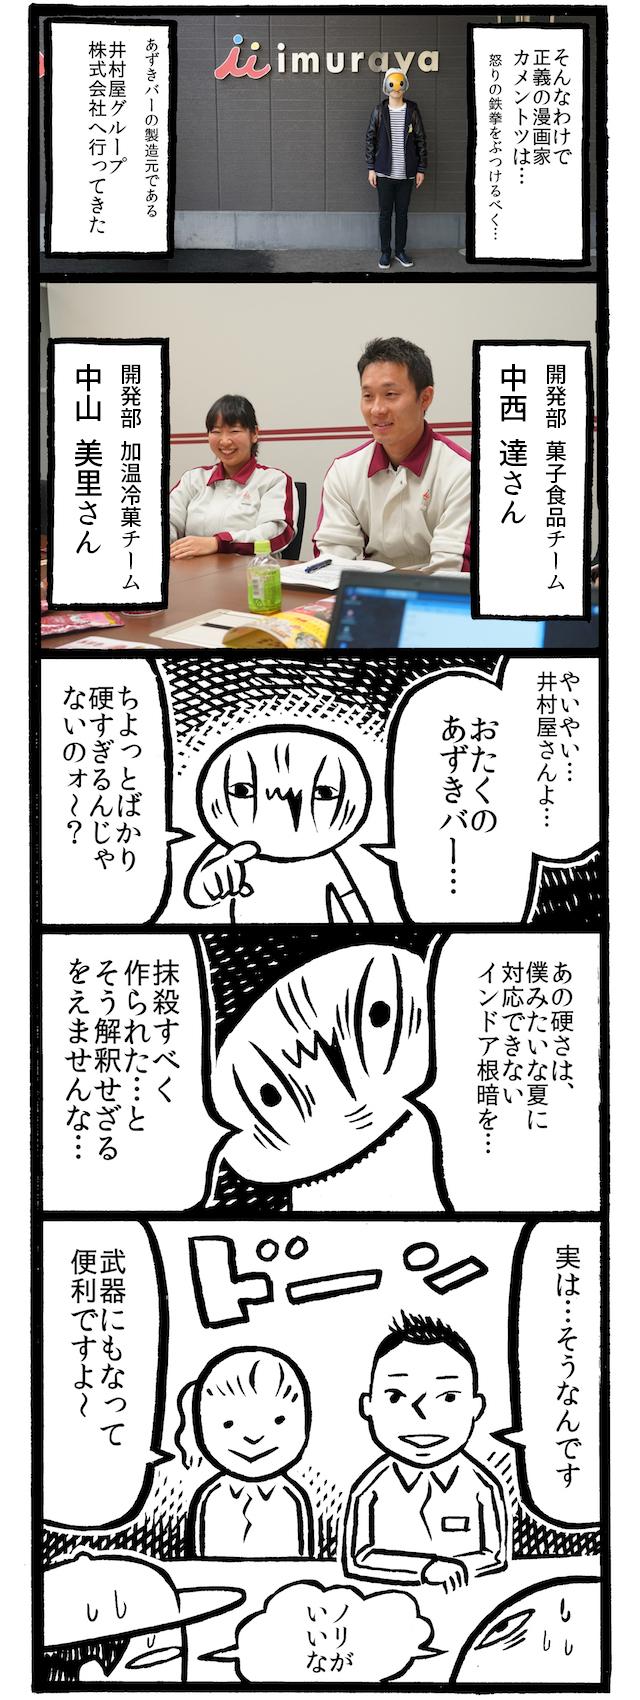 f:id:ryo_kato:20160913103336j:plain